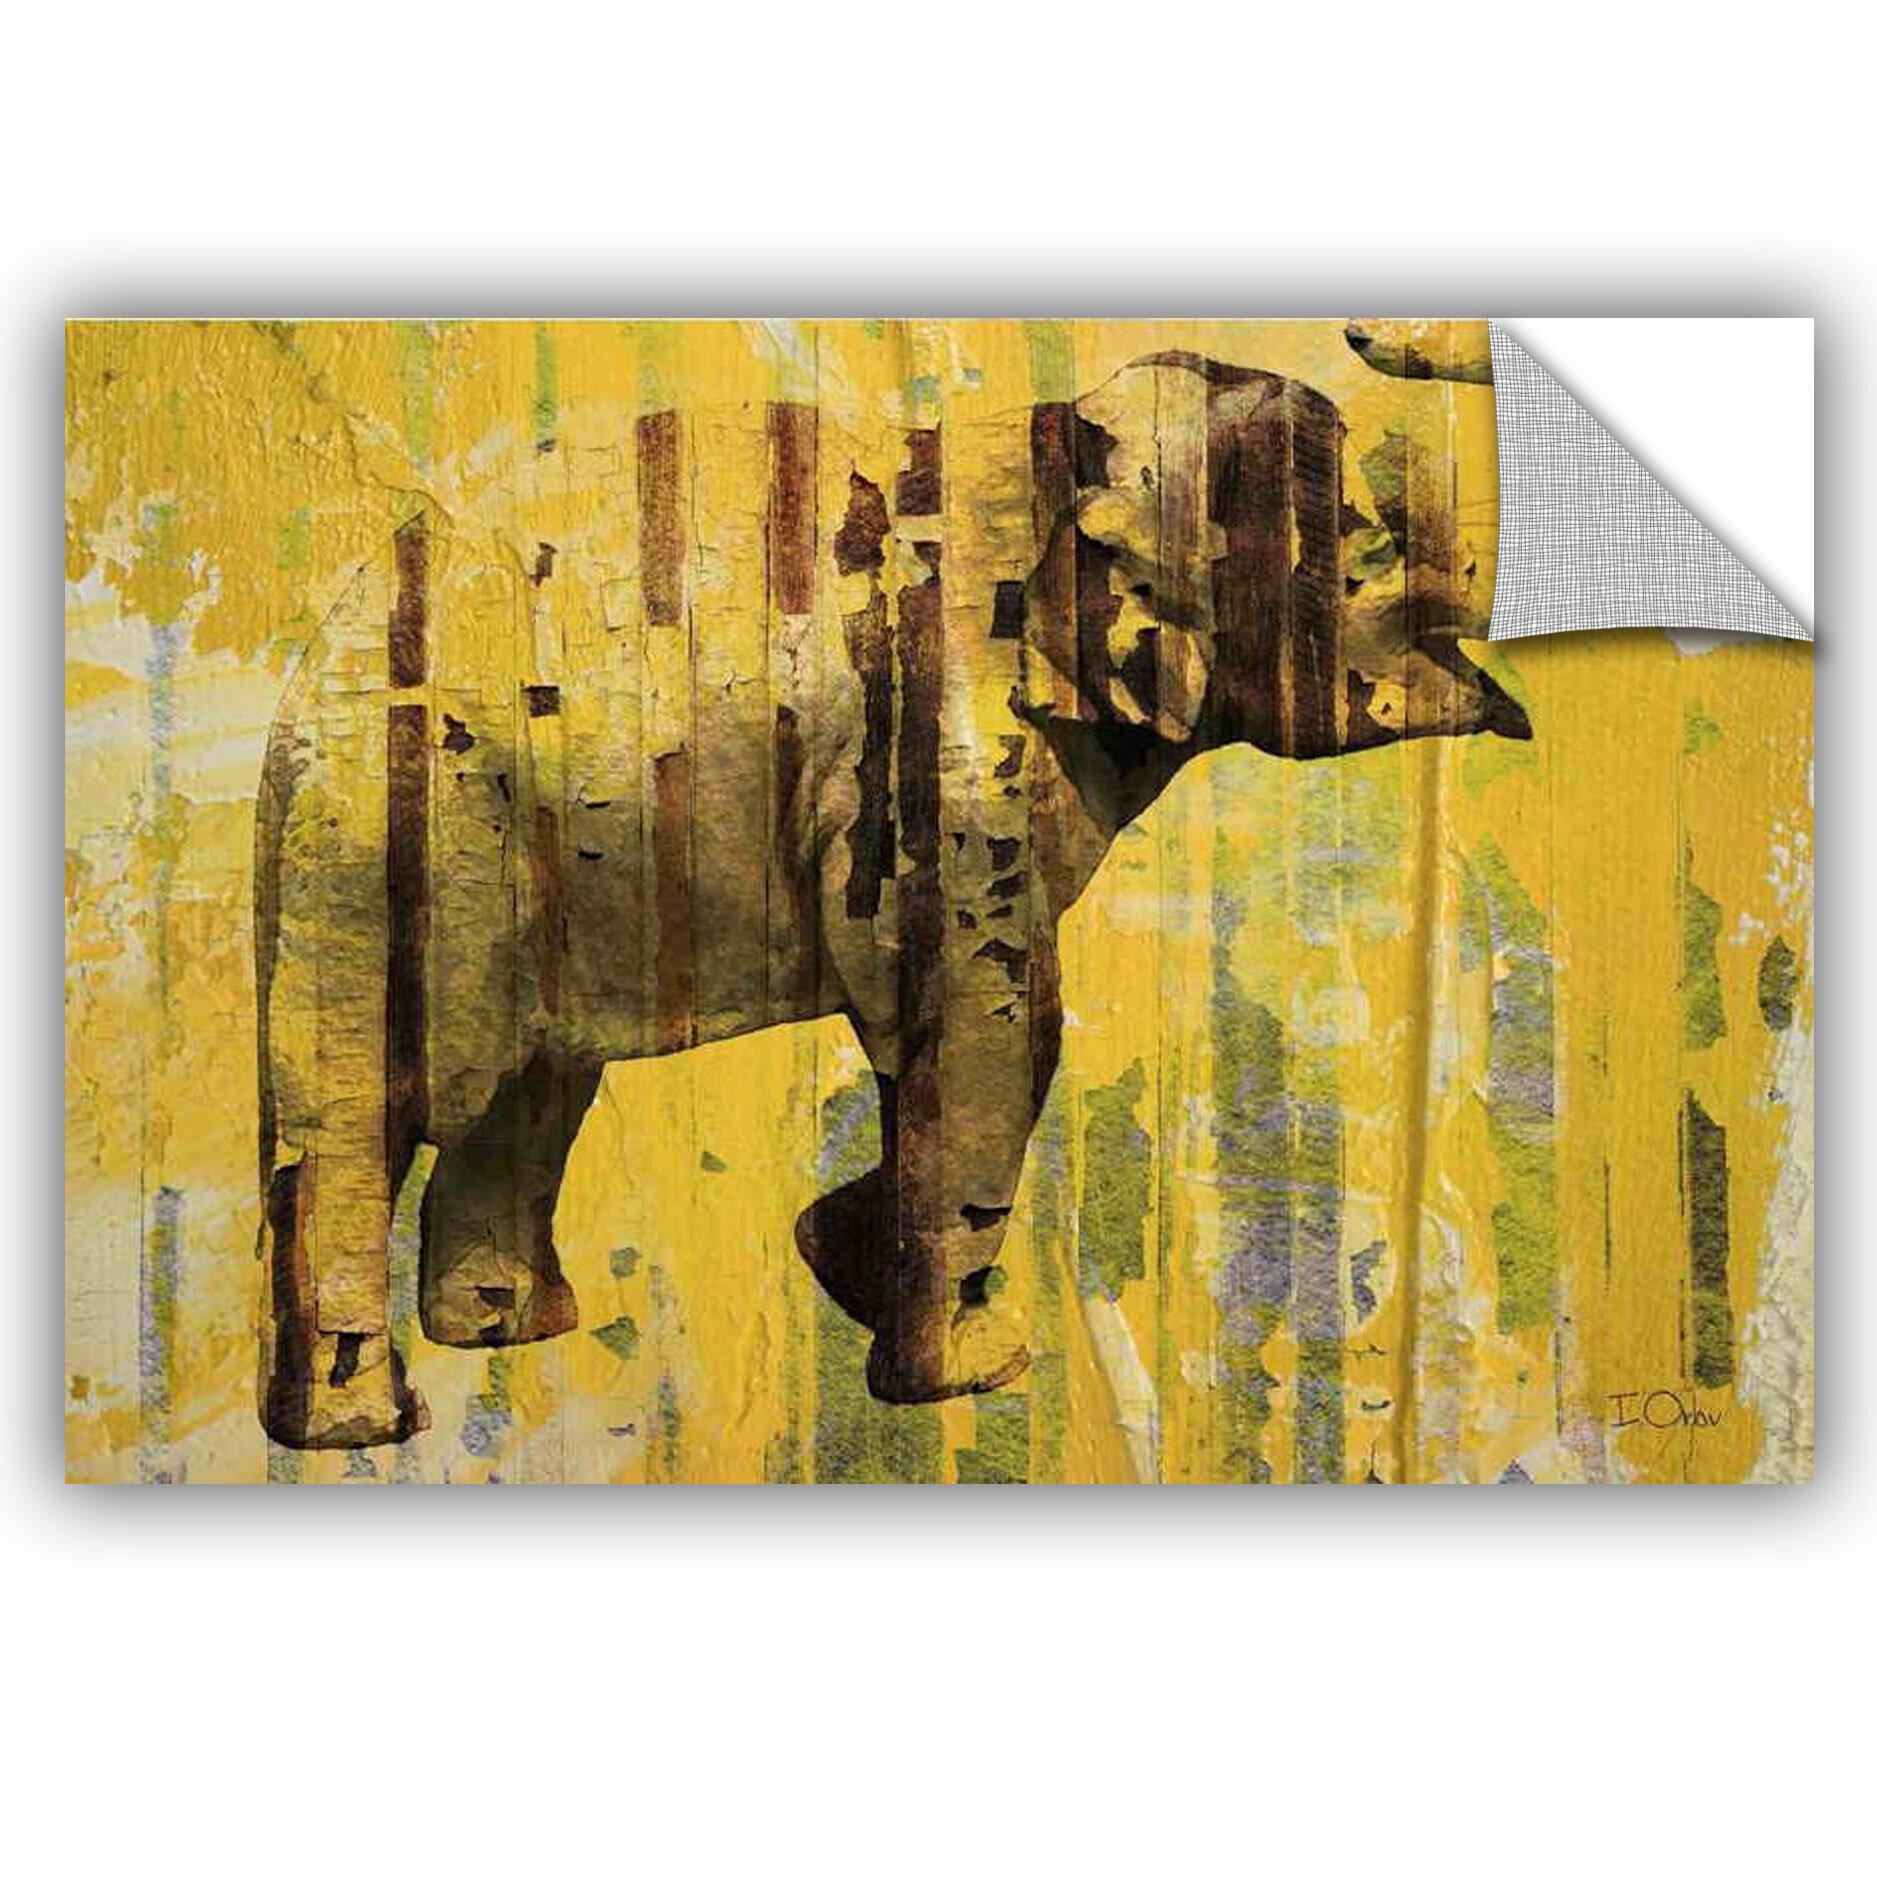 ArtWall Irena Orlov Elephant Wall Decal | Wayfair